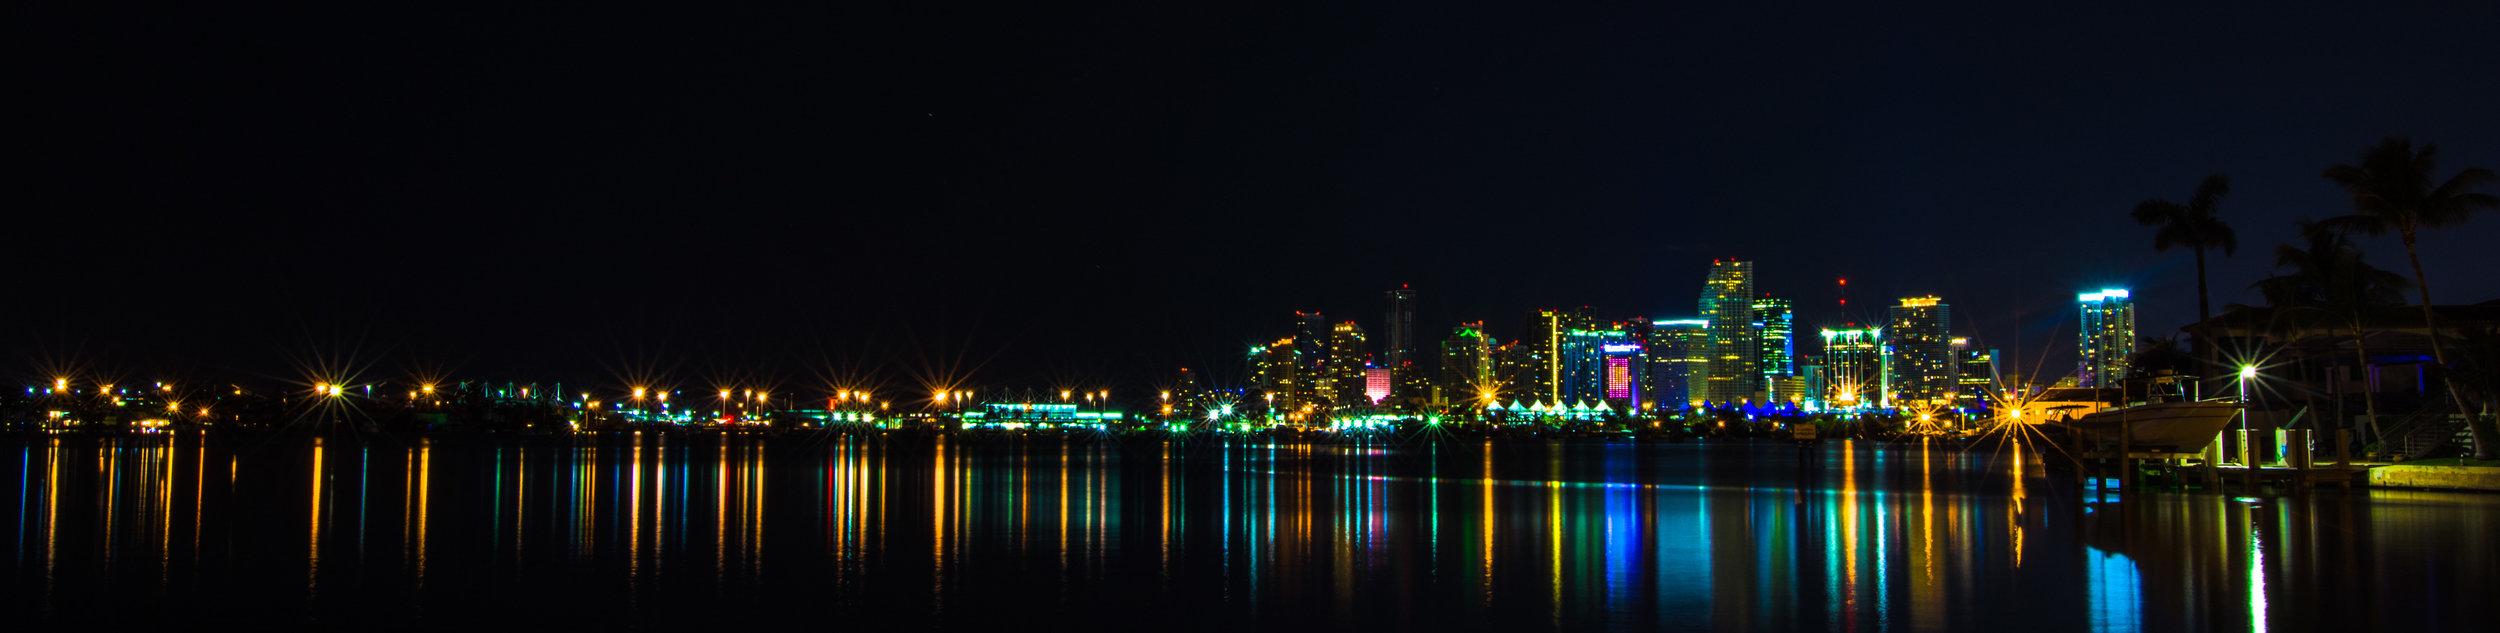 November: Cityi nights | Miami, FL - A first attempt at capturing cityscapes at night.